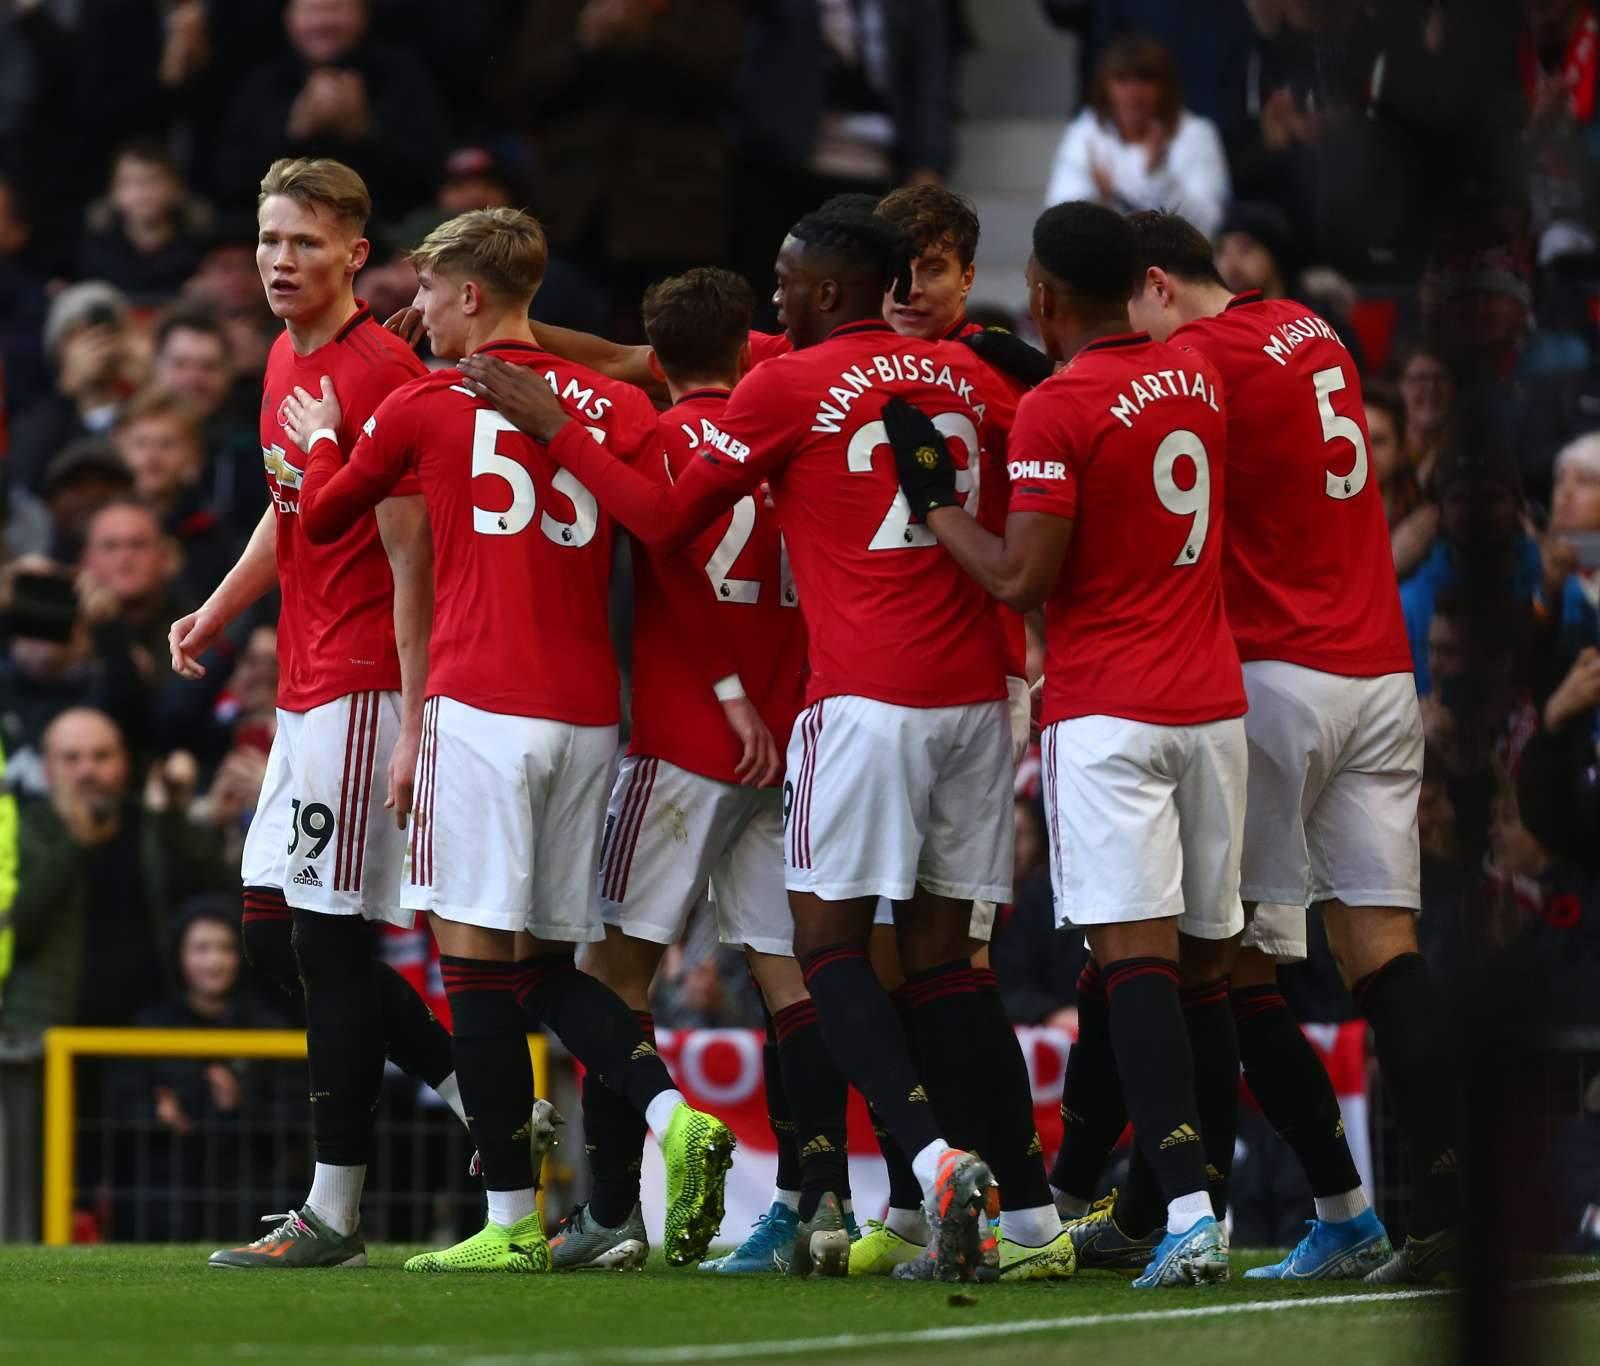 Сильвестр назвал три команды, претендующие на титул АПЛ - «Манчестер Сити» нет в списке